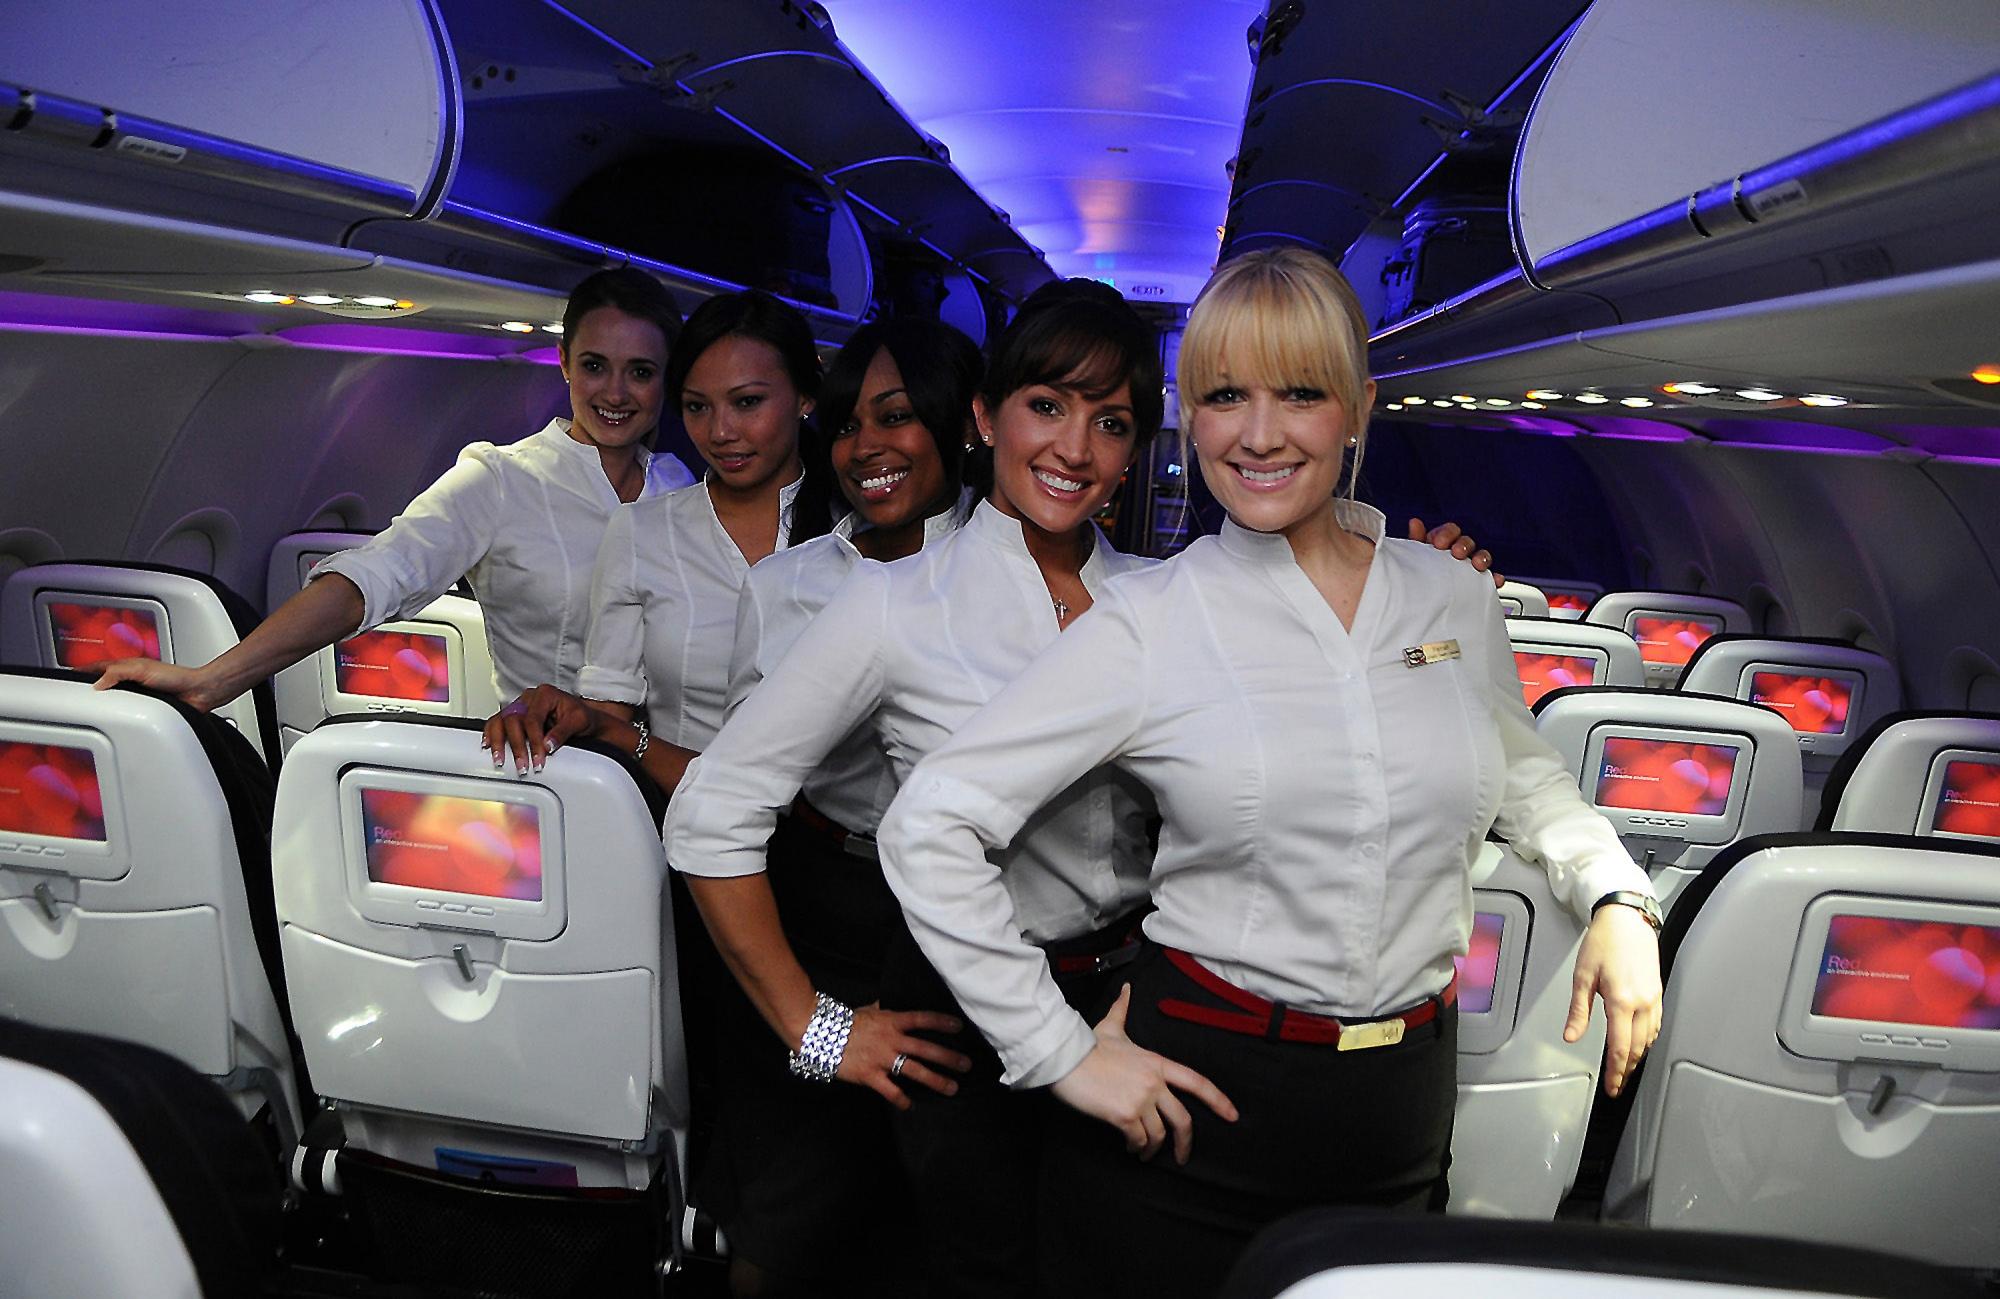 Virgin galactic delays key test flight after pandemic causes shutdowns